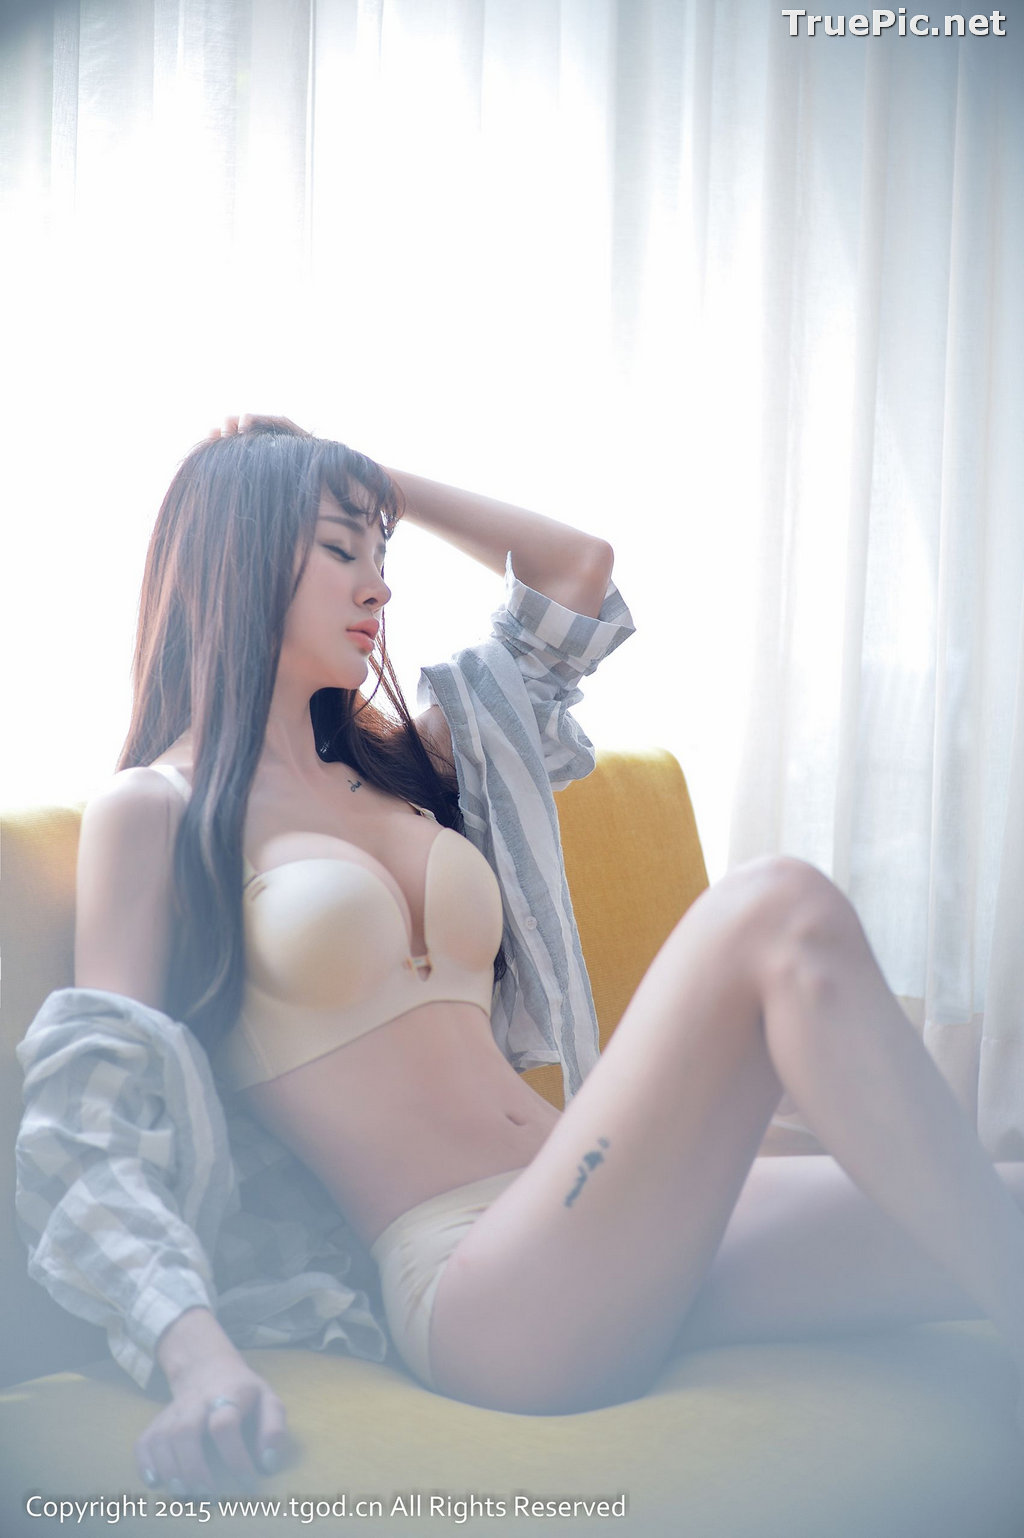 Image TGOD 2015-11-10 - Chinese Sexy Model - Cheryl (青树) - TruePic.net - Picture-7